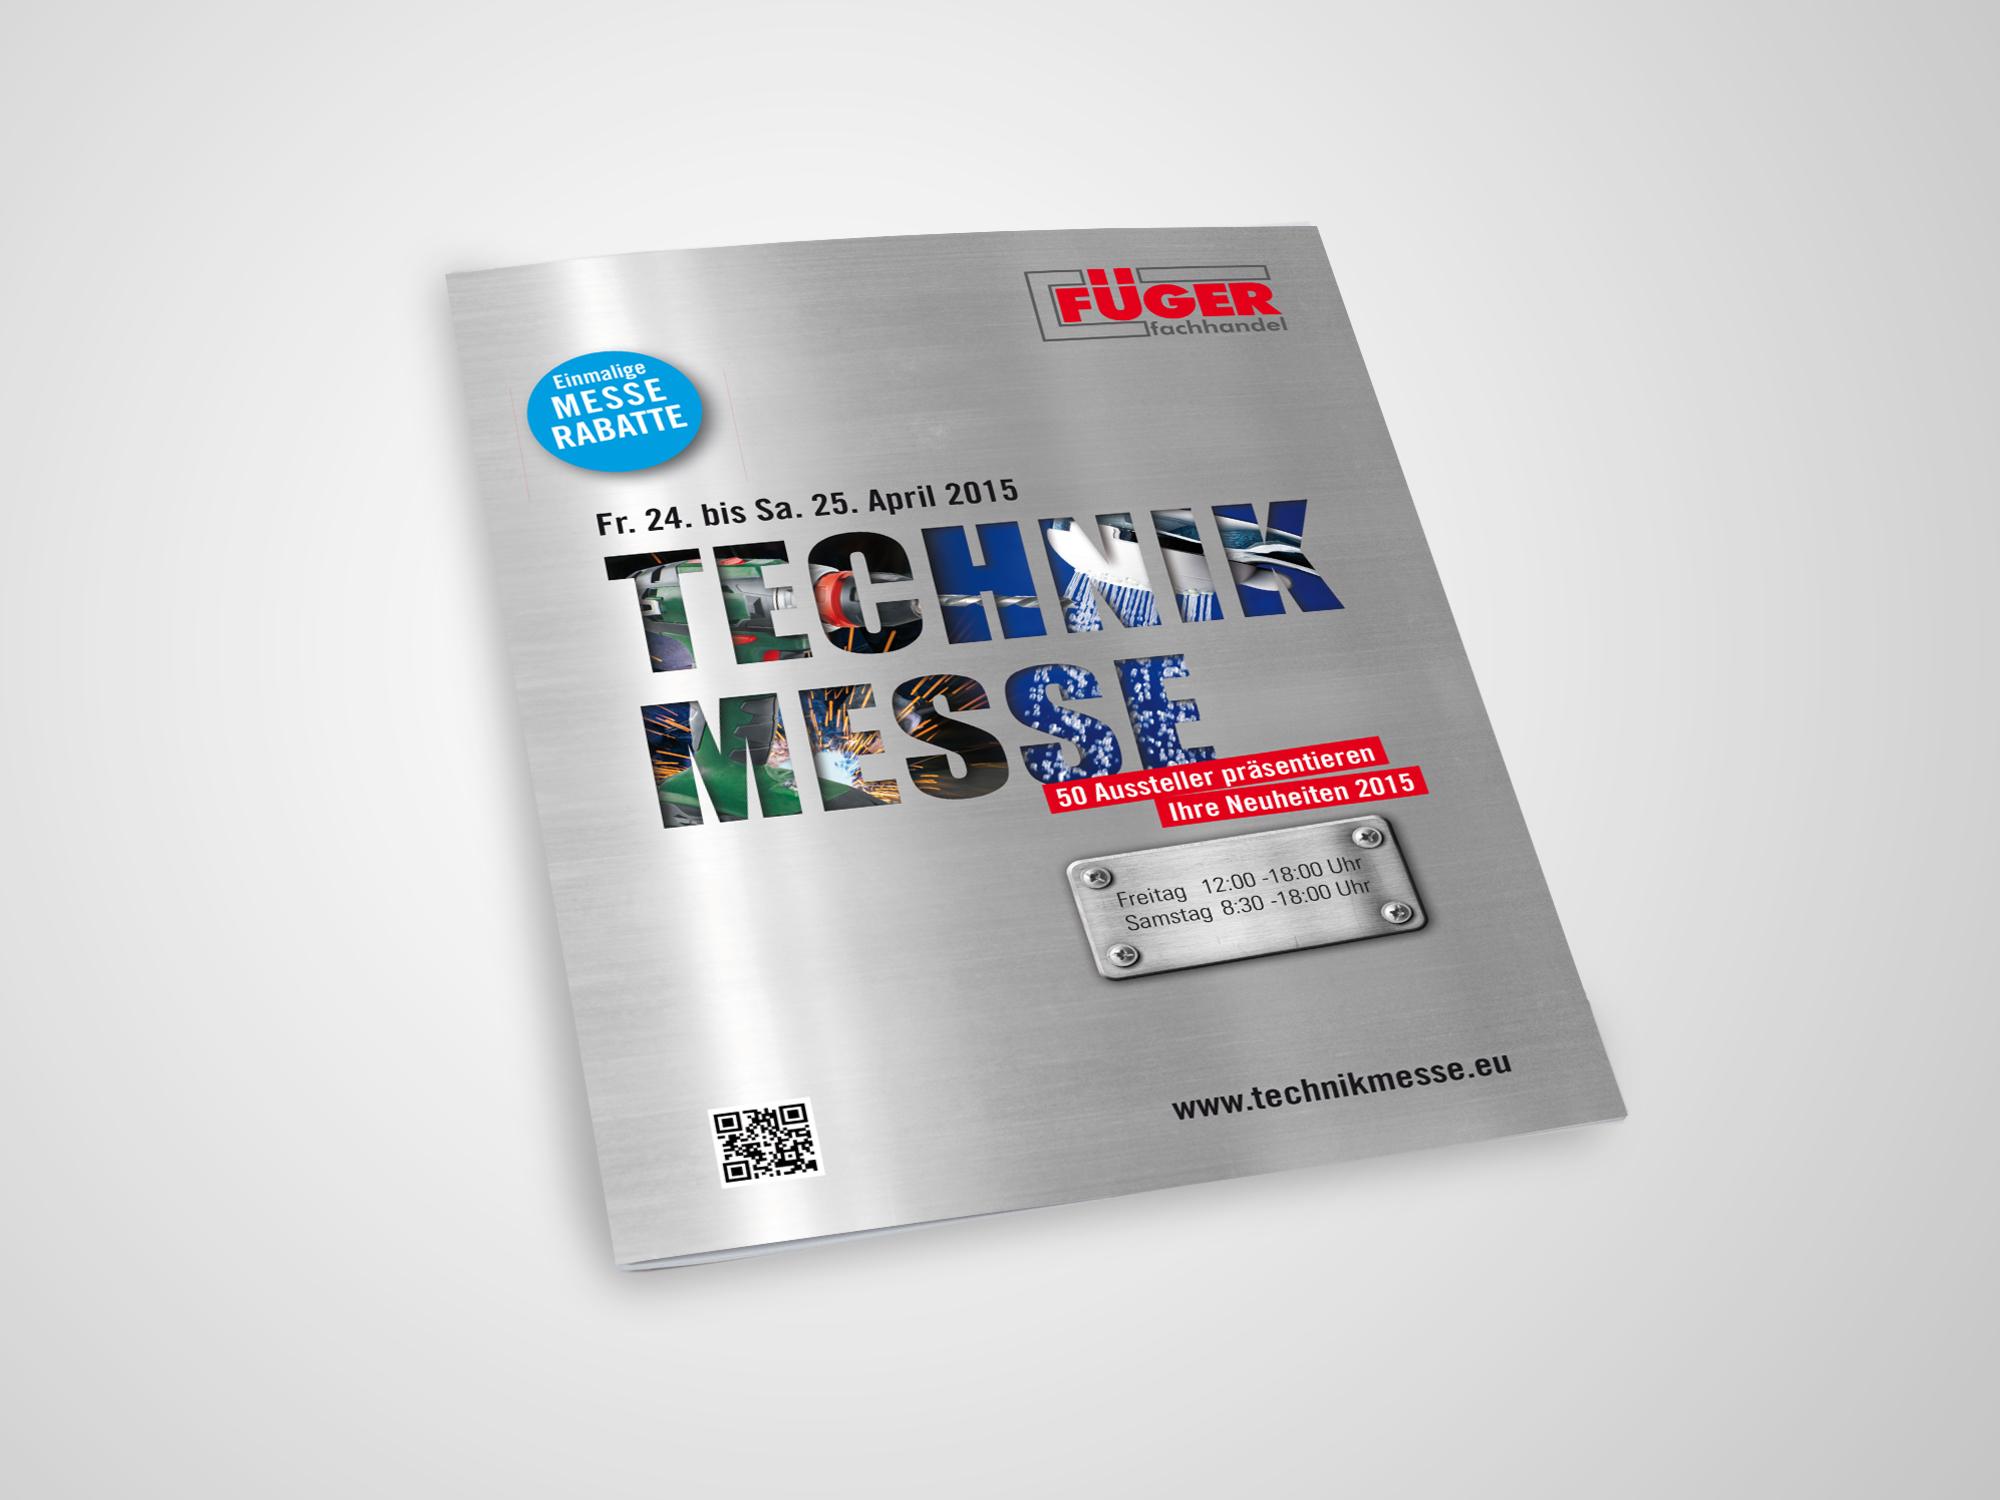 Corporate-Design-Fueger-Messekatalog